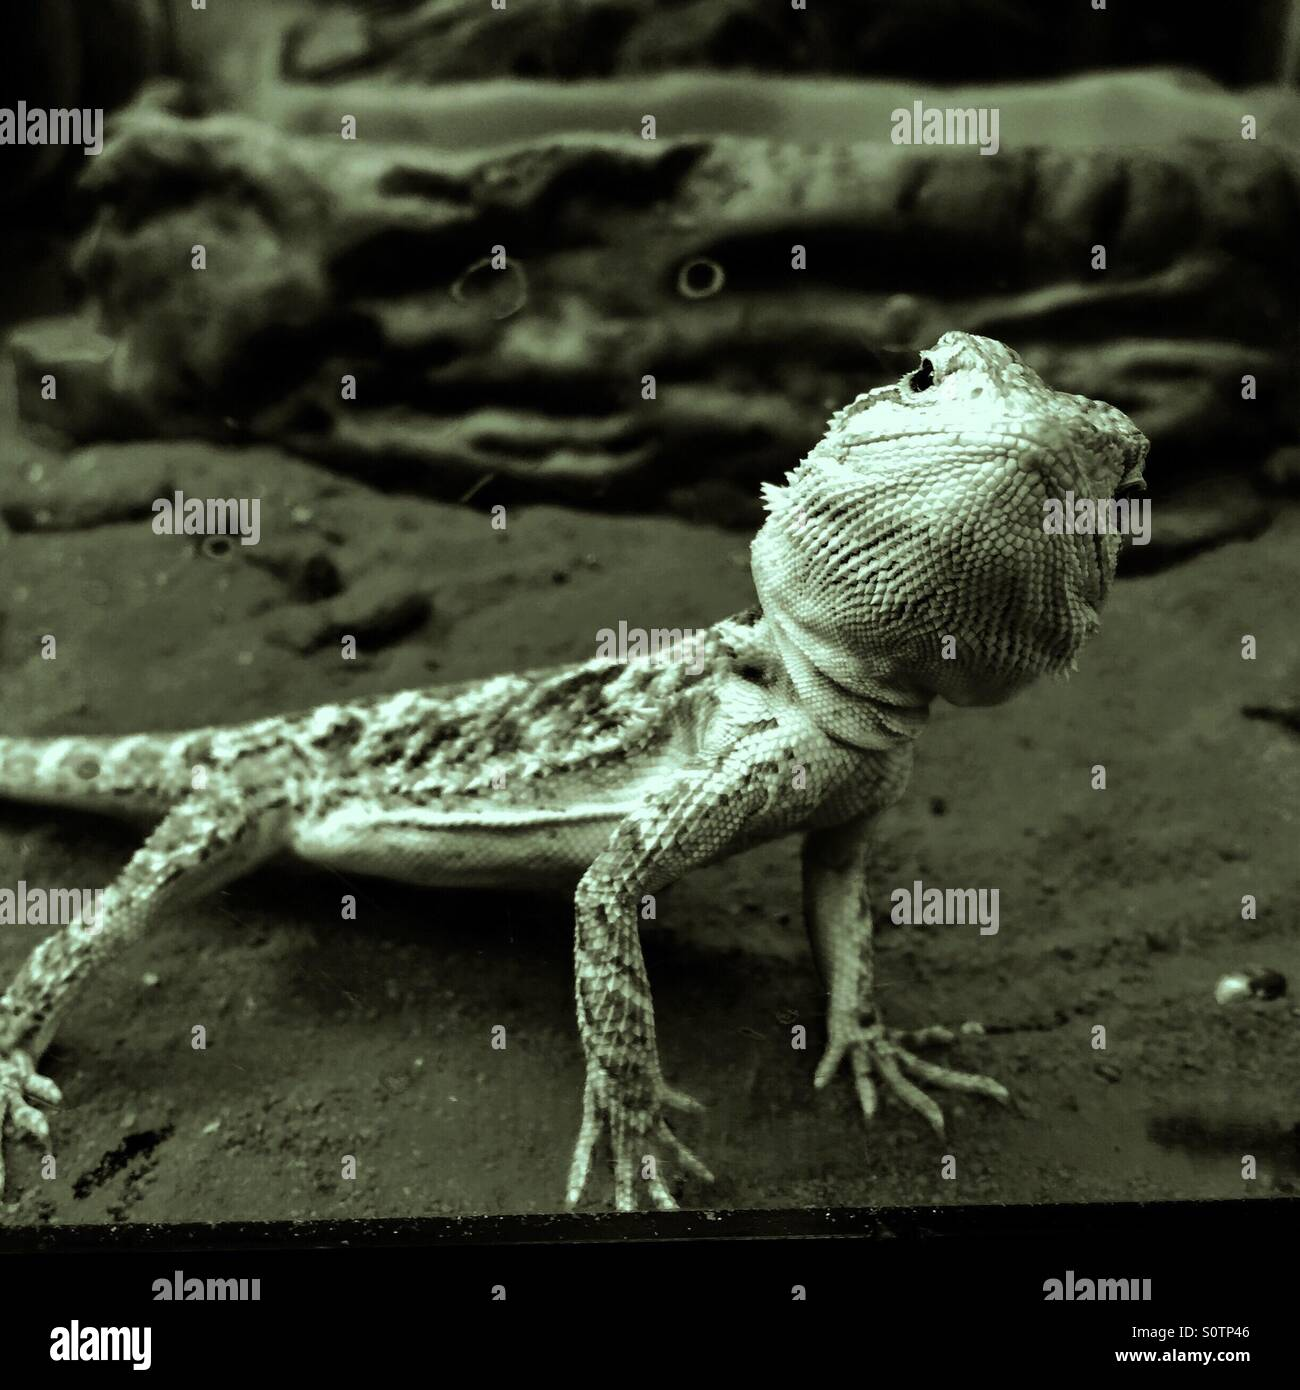 Belligerent Bearded Dragon Lizard - Stock Image